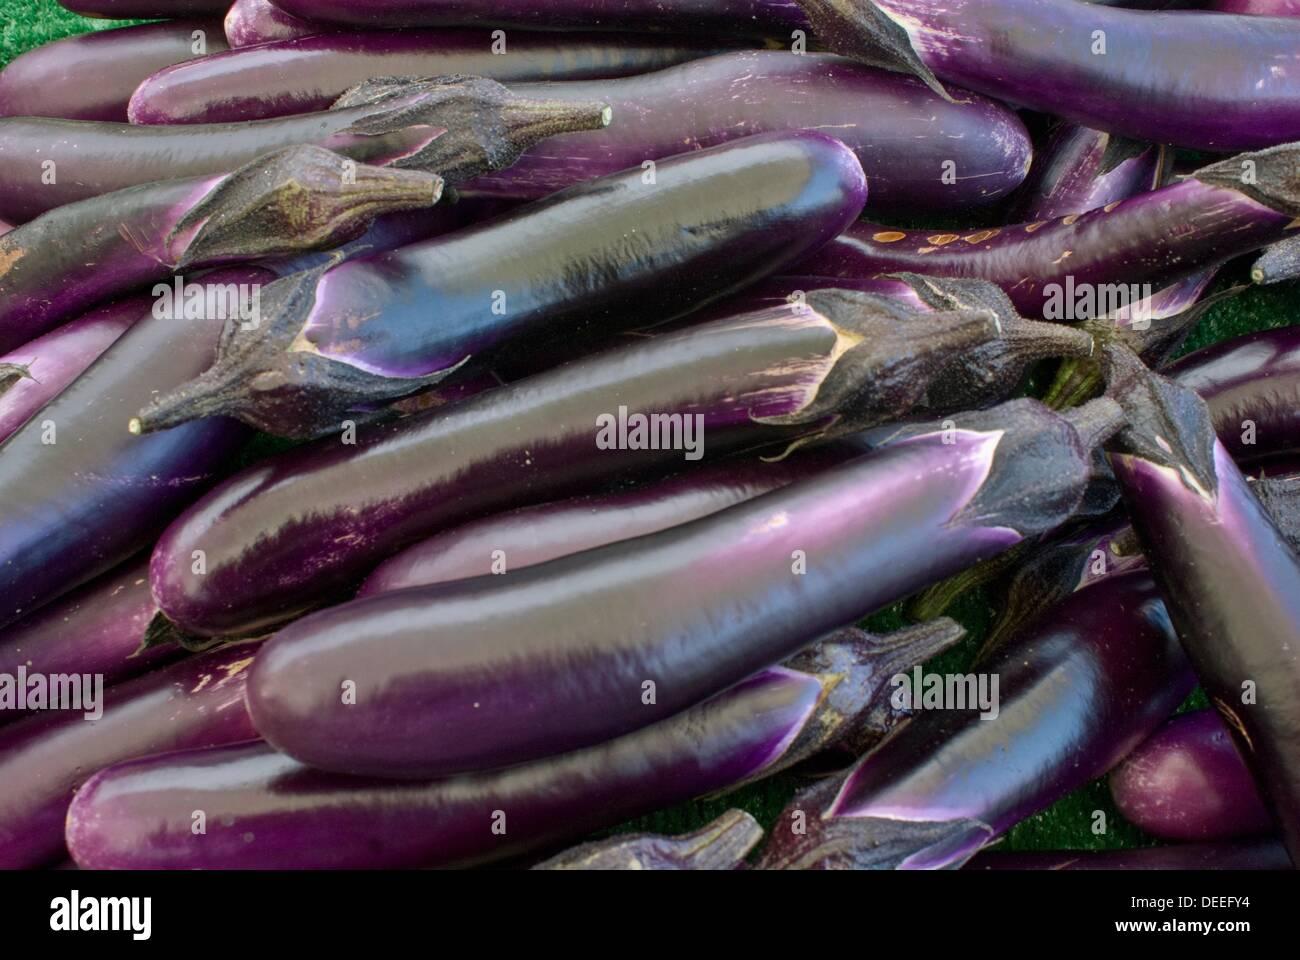 Organic eggplants at farmers market in upscale California city near San Francisco - Stock Image